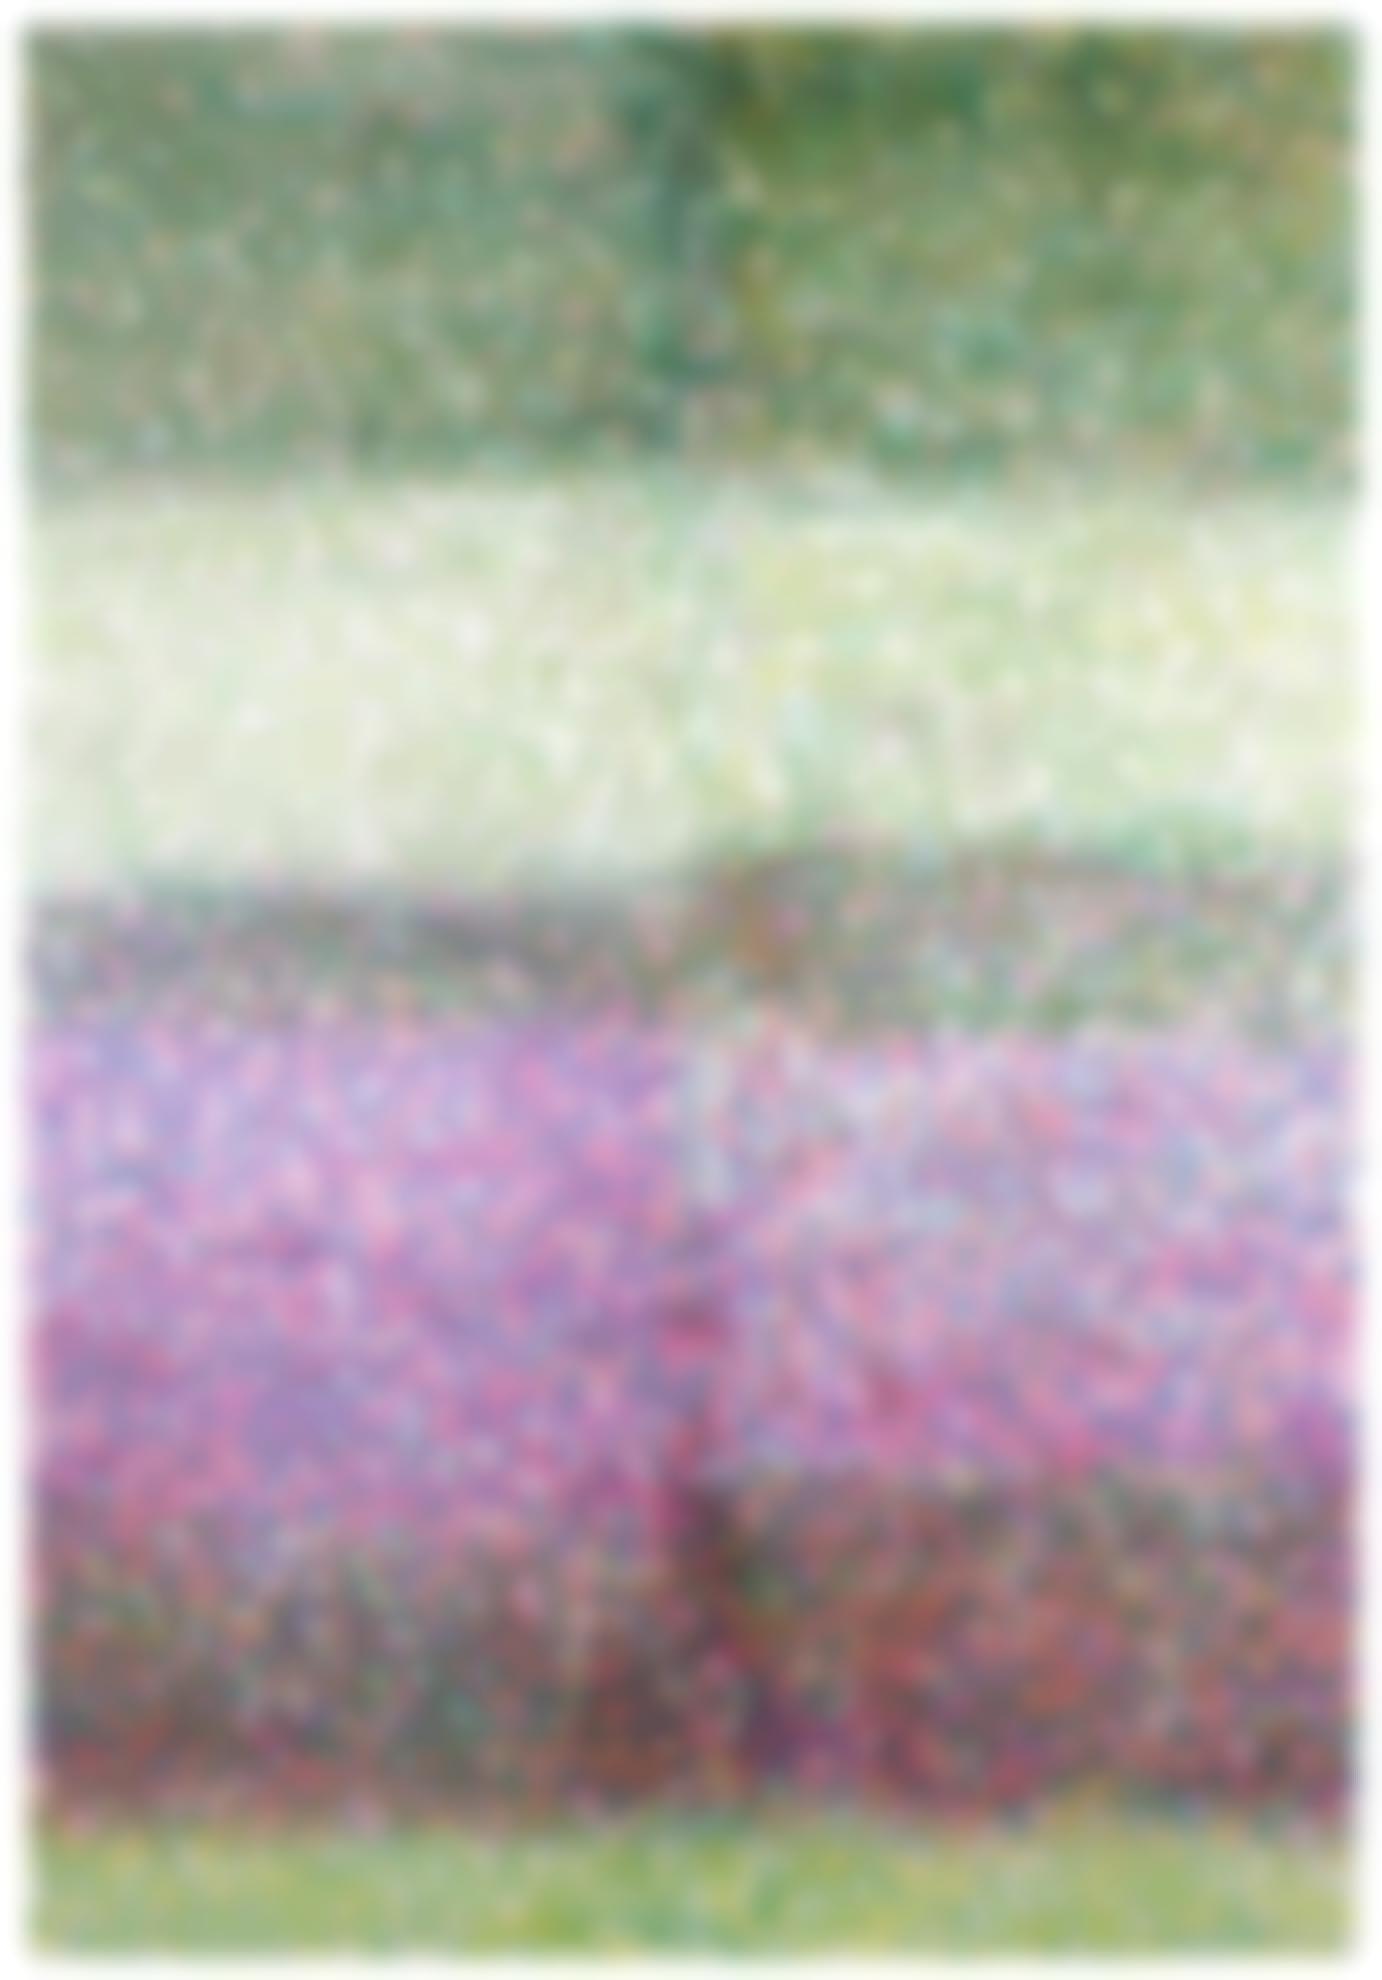 Parker Ito-Inkjet Painting #11 (8 Color Ink, Variation)-2014